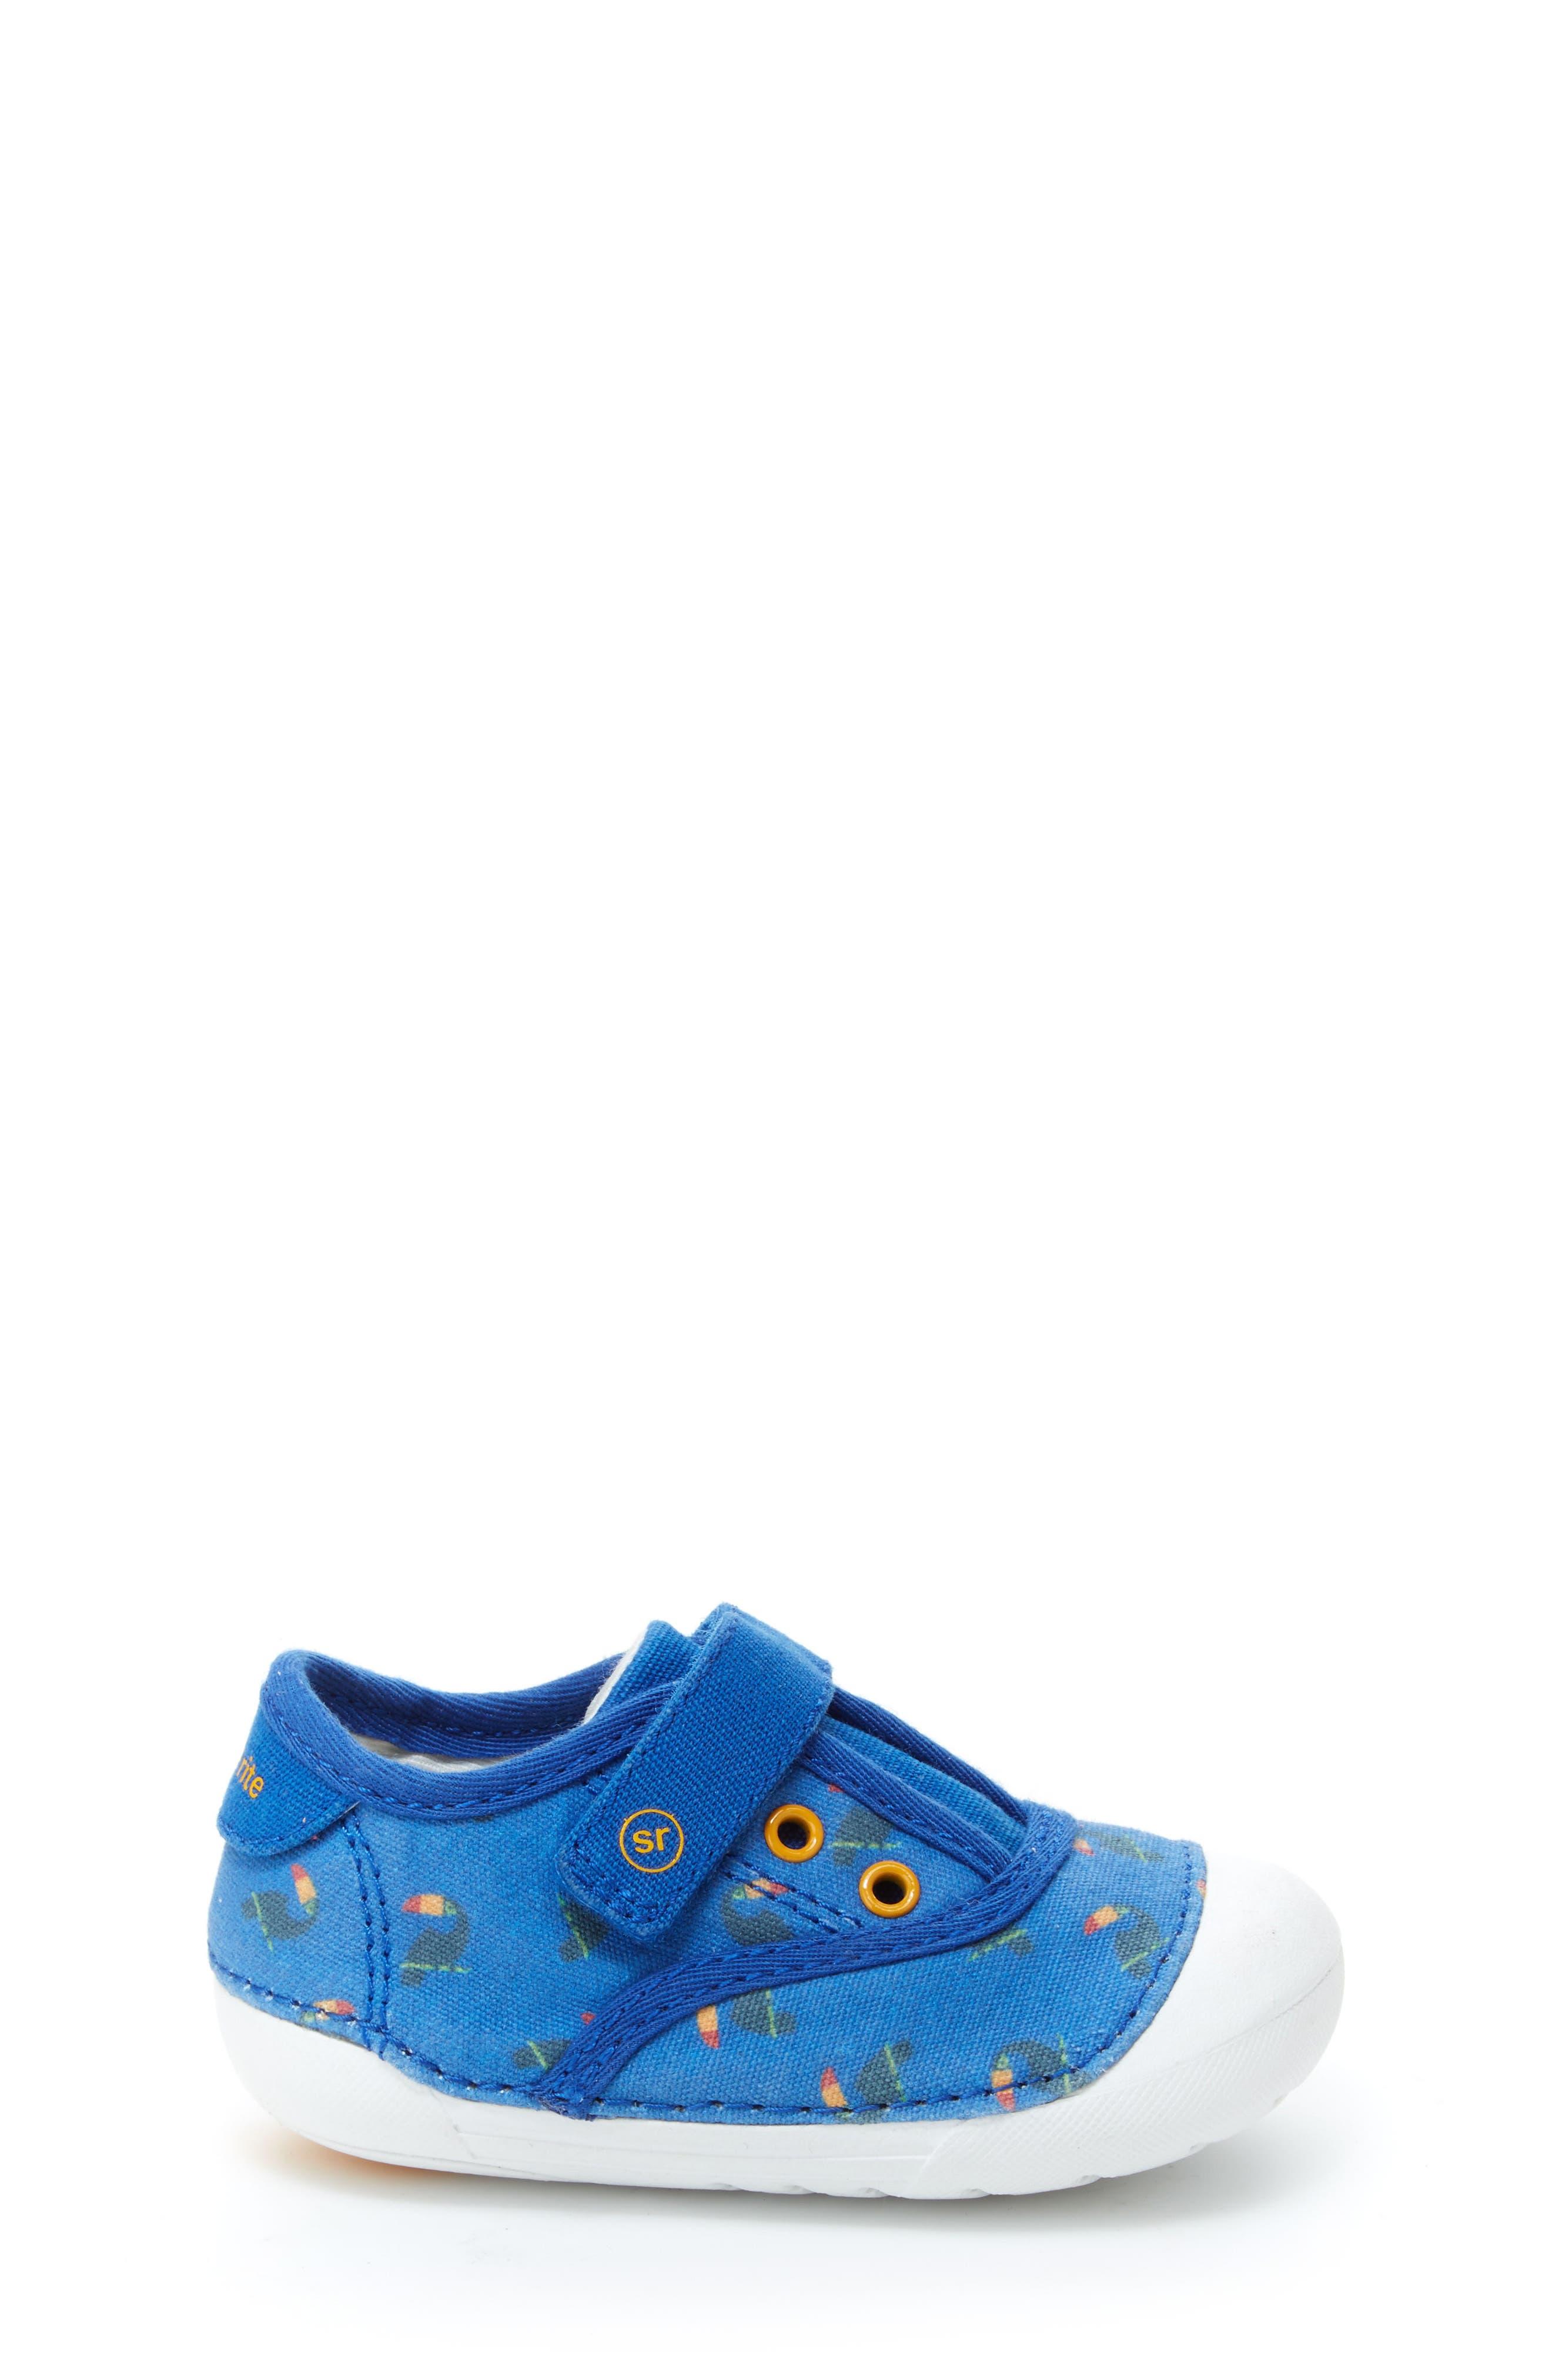 Soft Motion Avery Sneaker,                             Alternate thumbnail 2, color,                             Blue Toucan